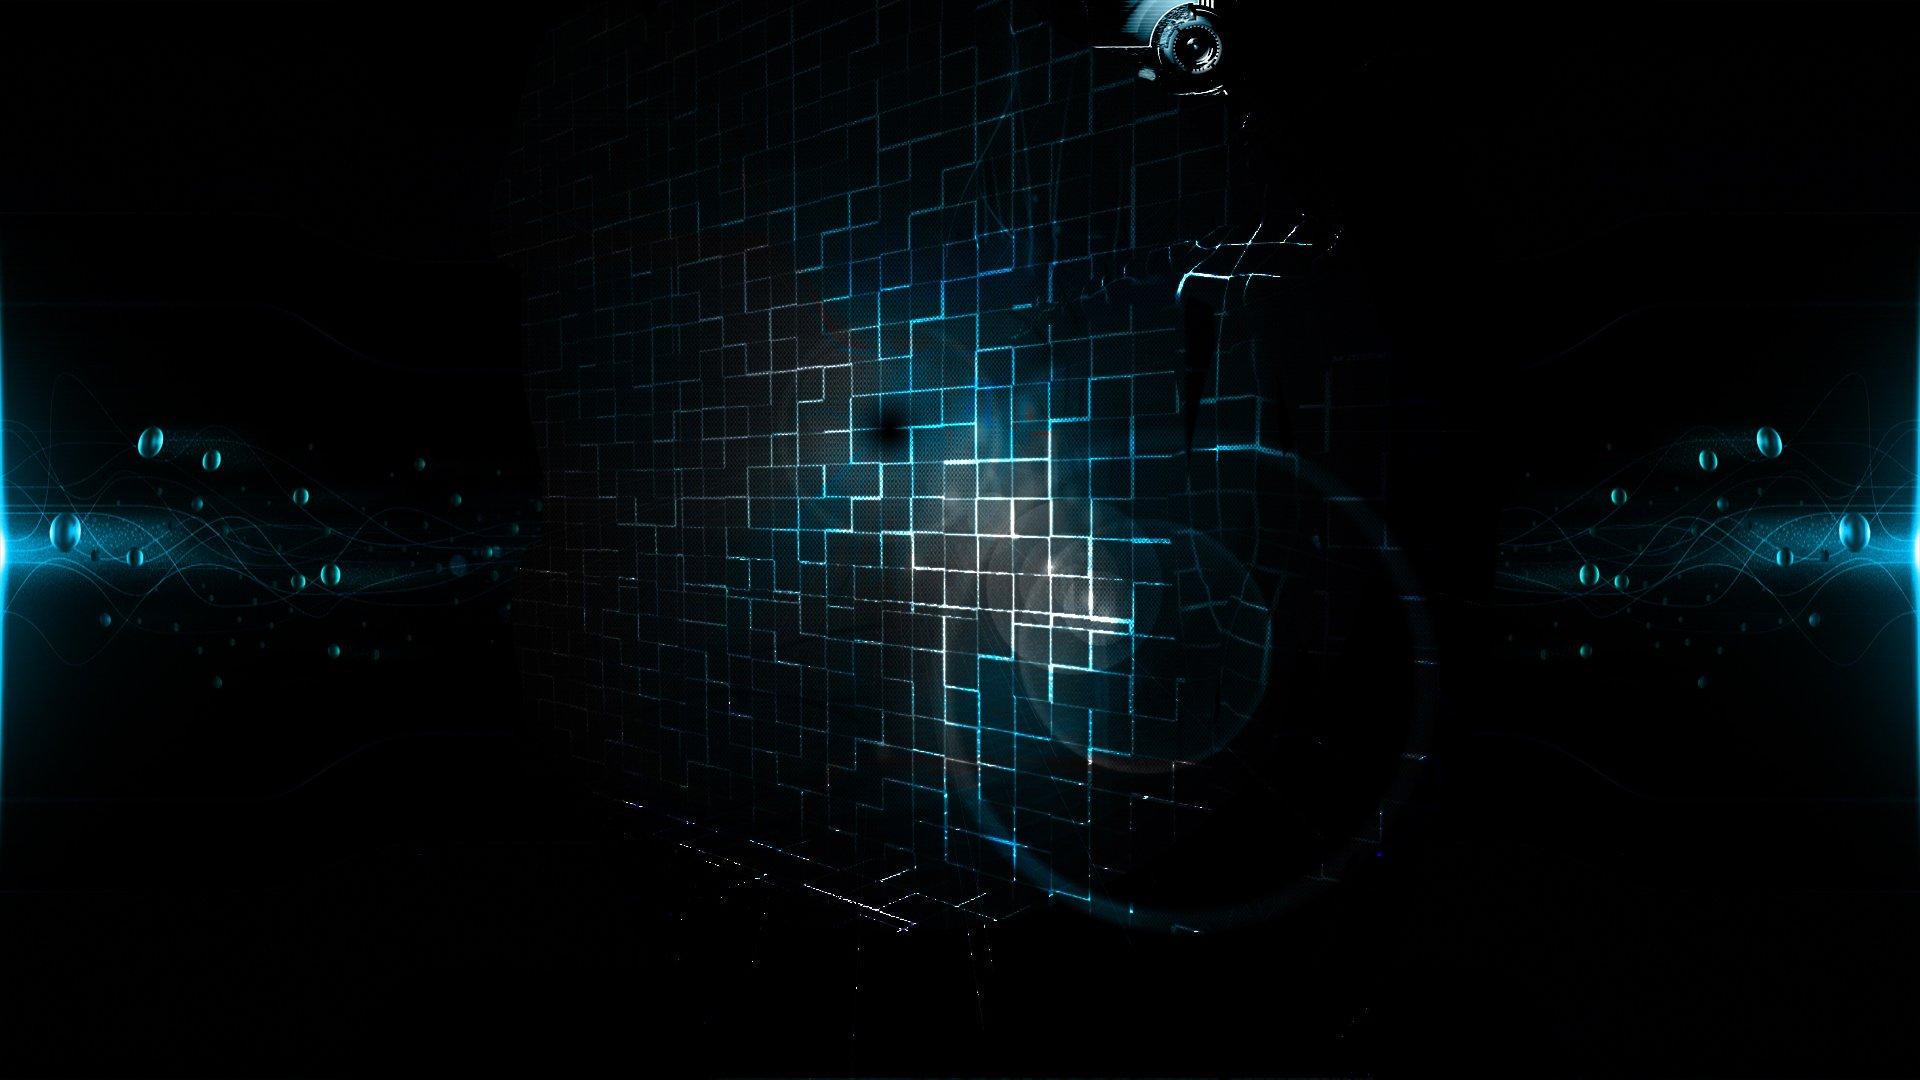 Artistic - 3D Art  Wallpaper